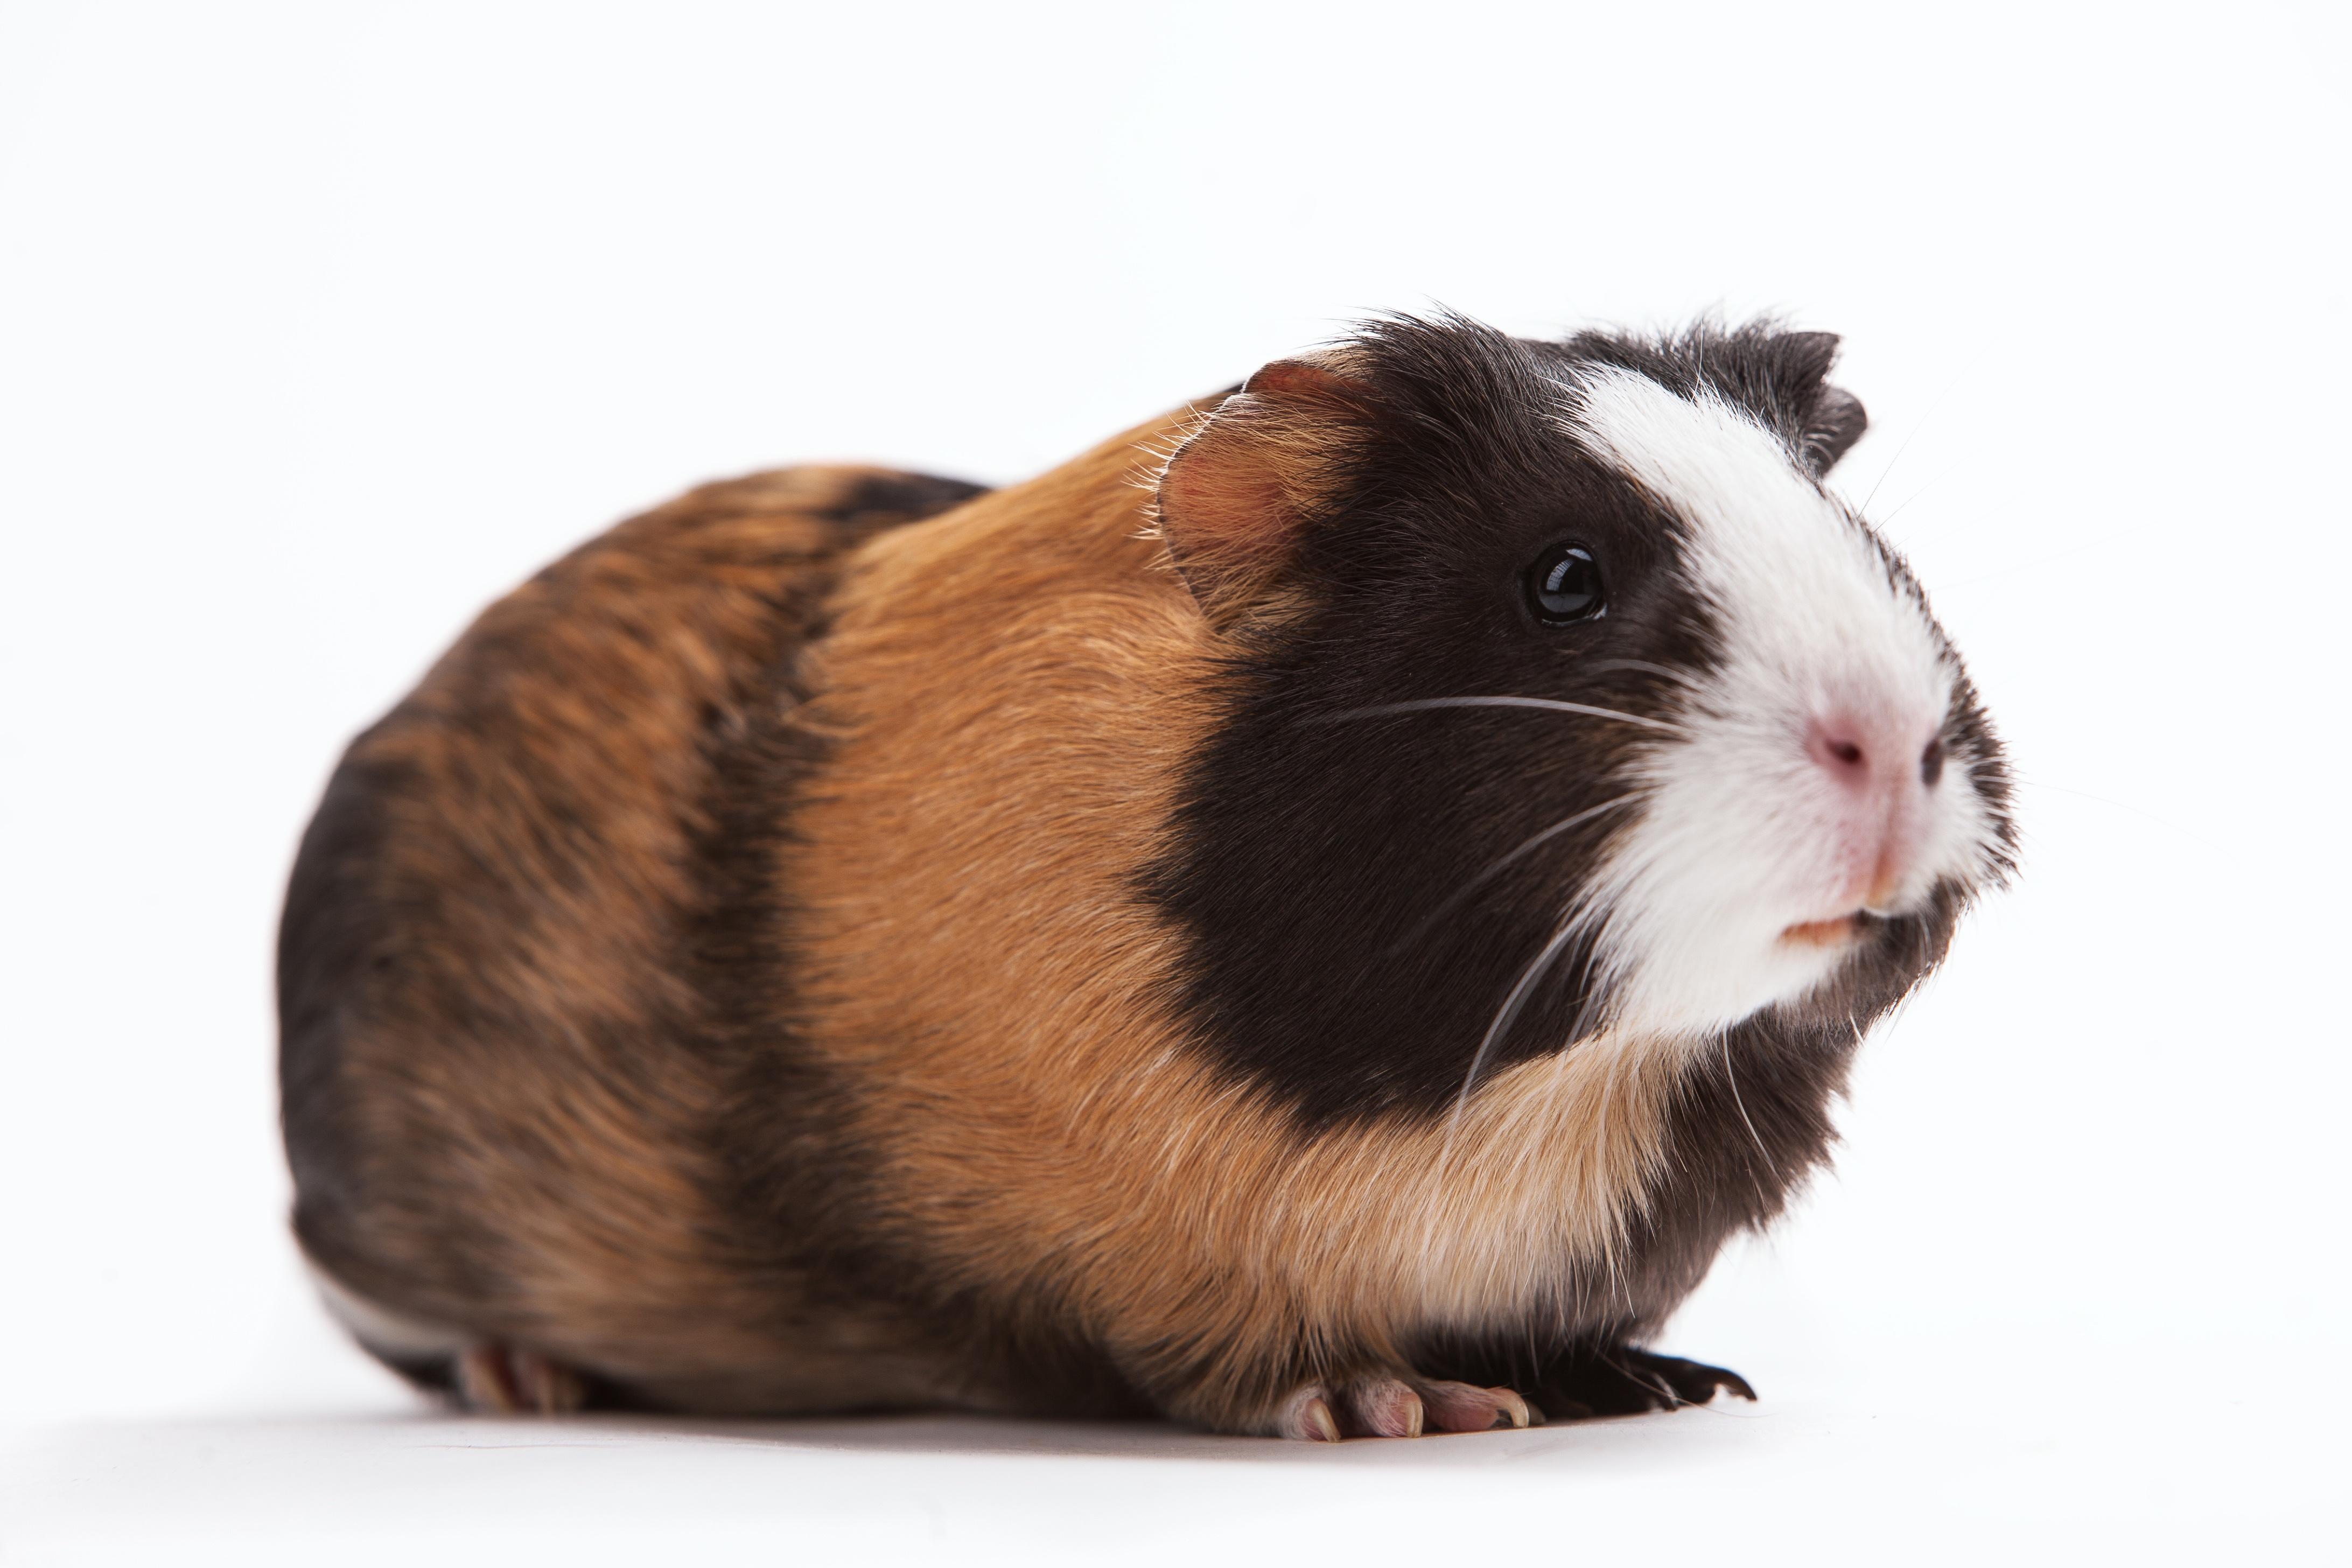 Why Guinea Pigs Make Good Pets Mission Ridge Animal Hospital